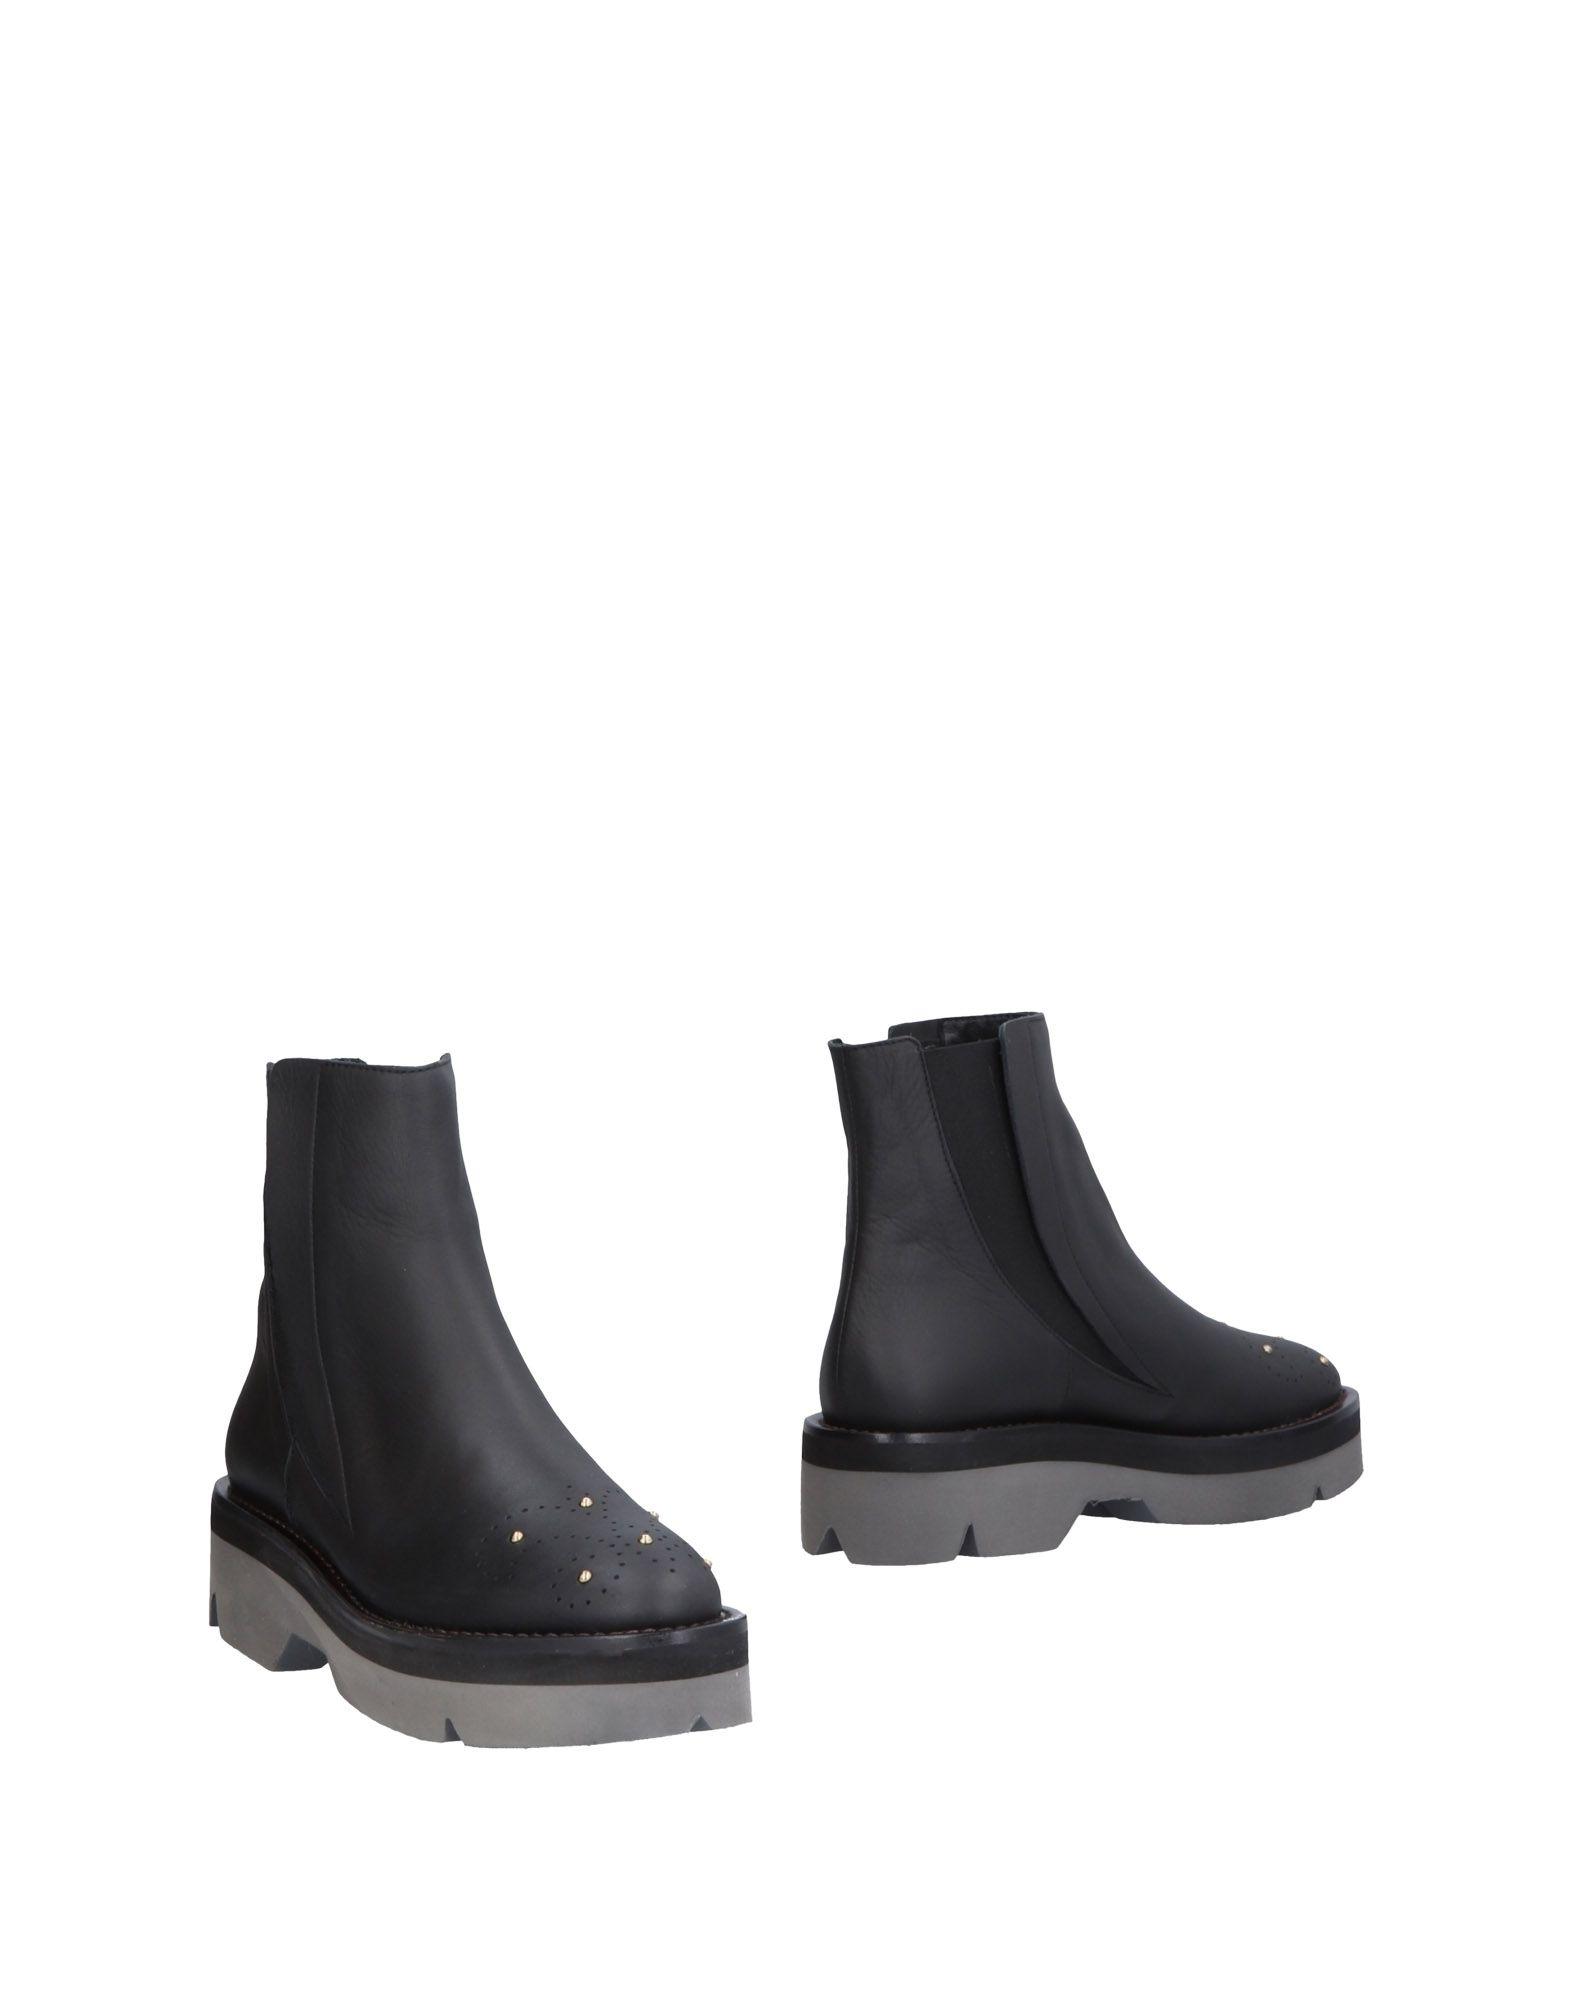 Stilvolle billige Schuhe Damen Giorgio Fabiani Chelsea Stiefel Damen Schuhe  11468693JR 9d6bd8